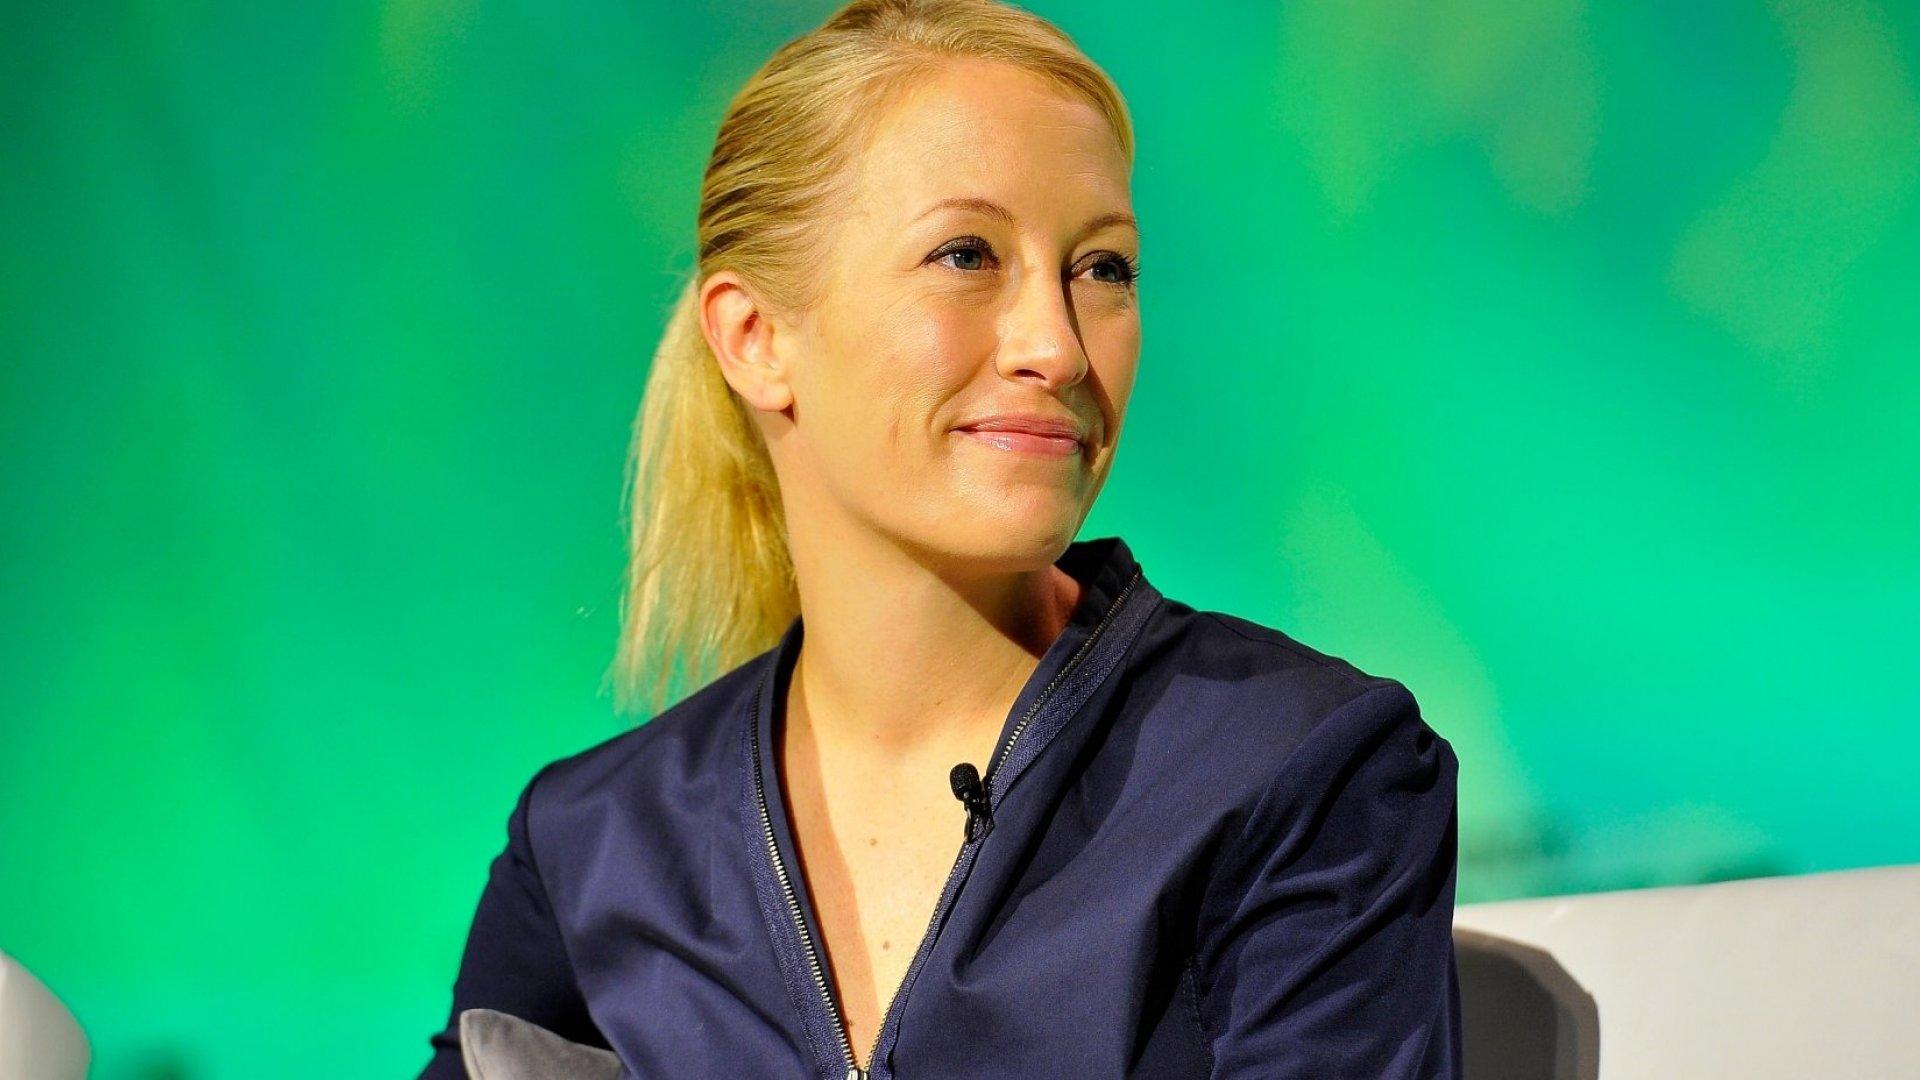 How Eventbrite's Julia Hartz Is Making Her Company Profitable